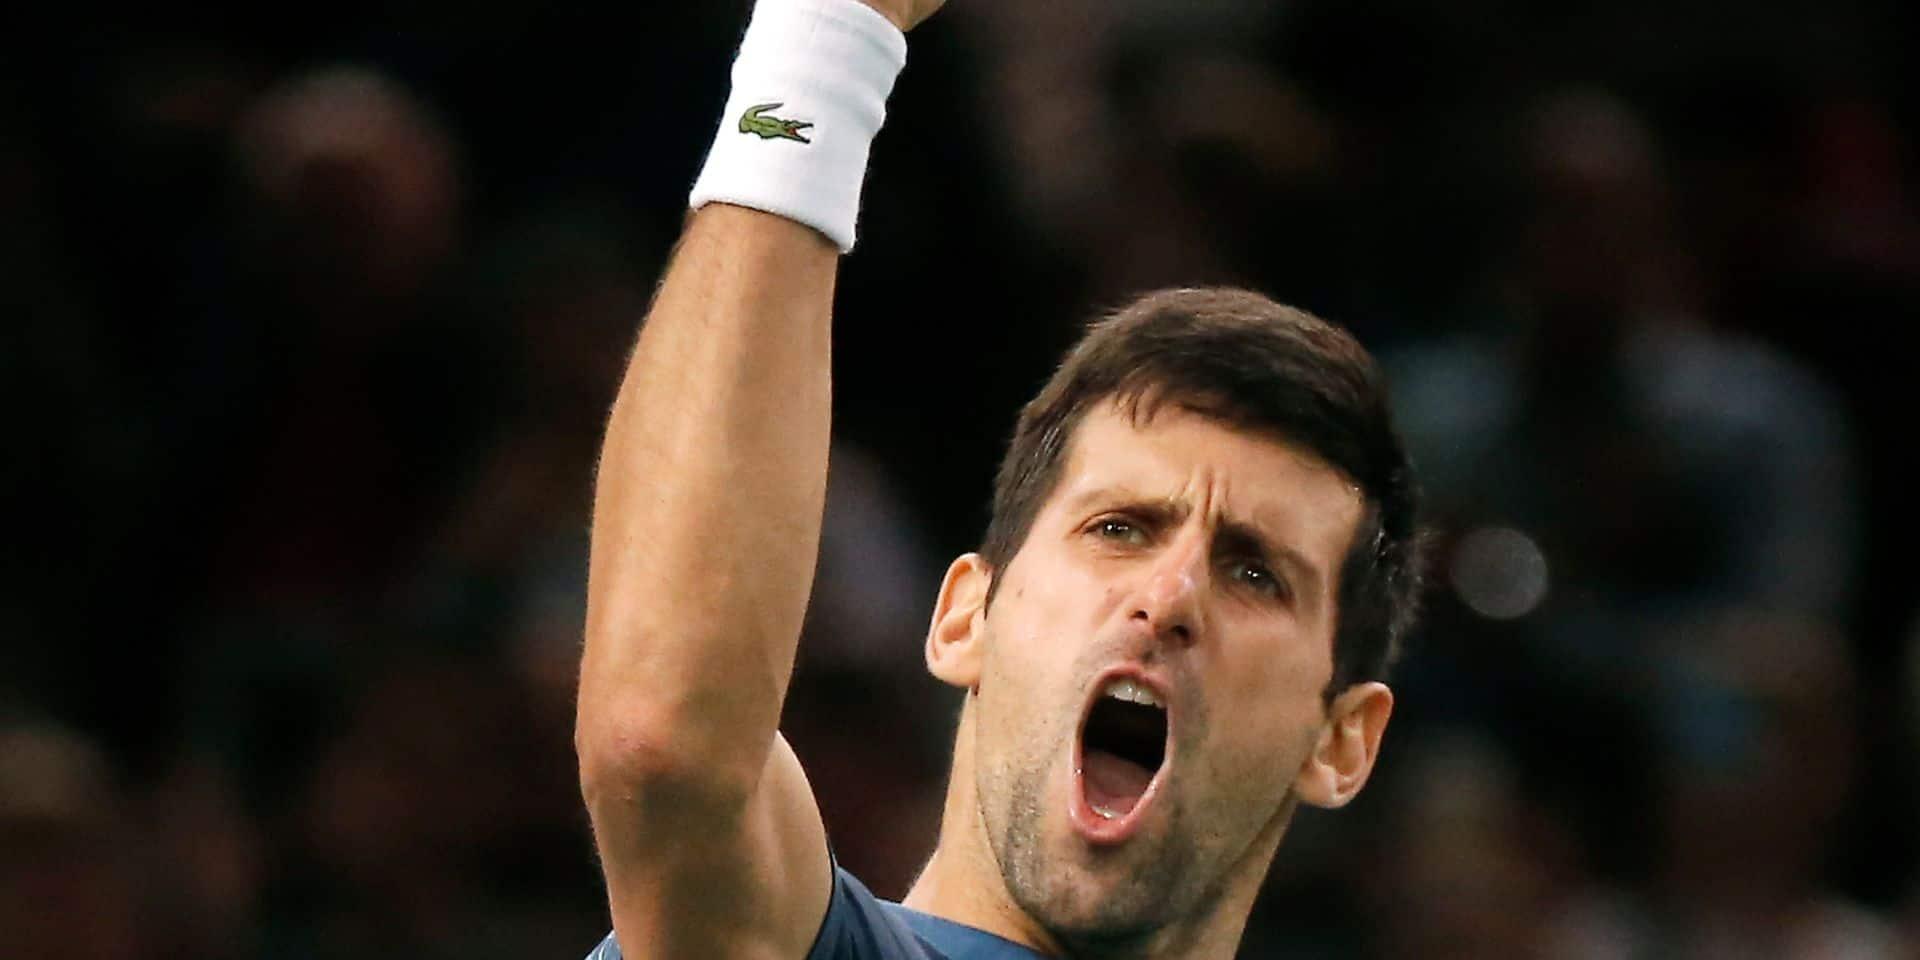 Le 47e Djokovic-Federer a tourné à l'avantage du Serbe